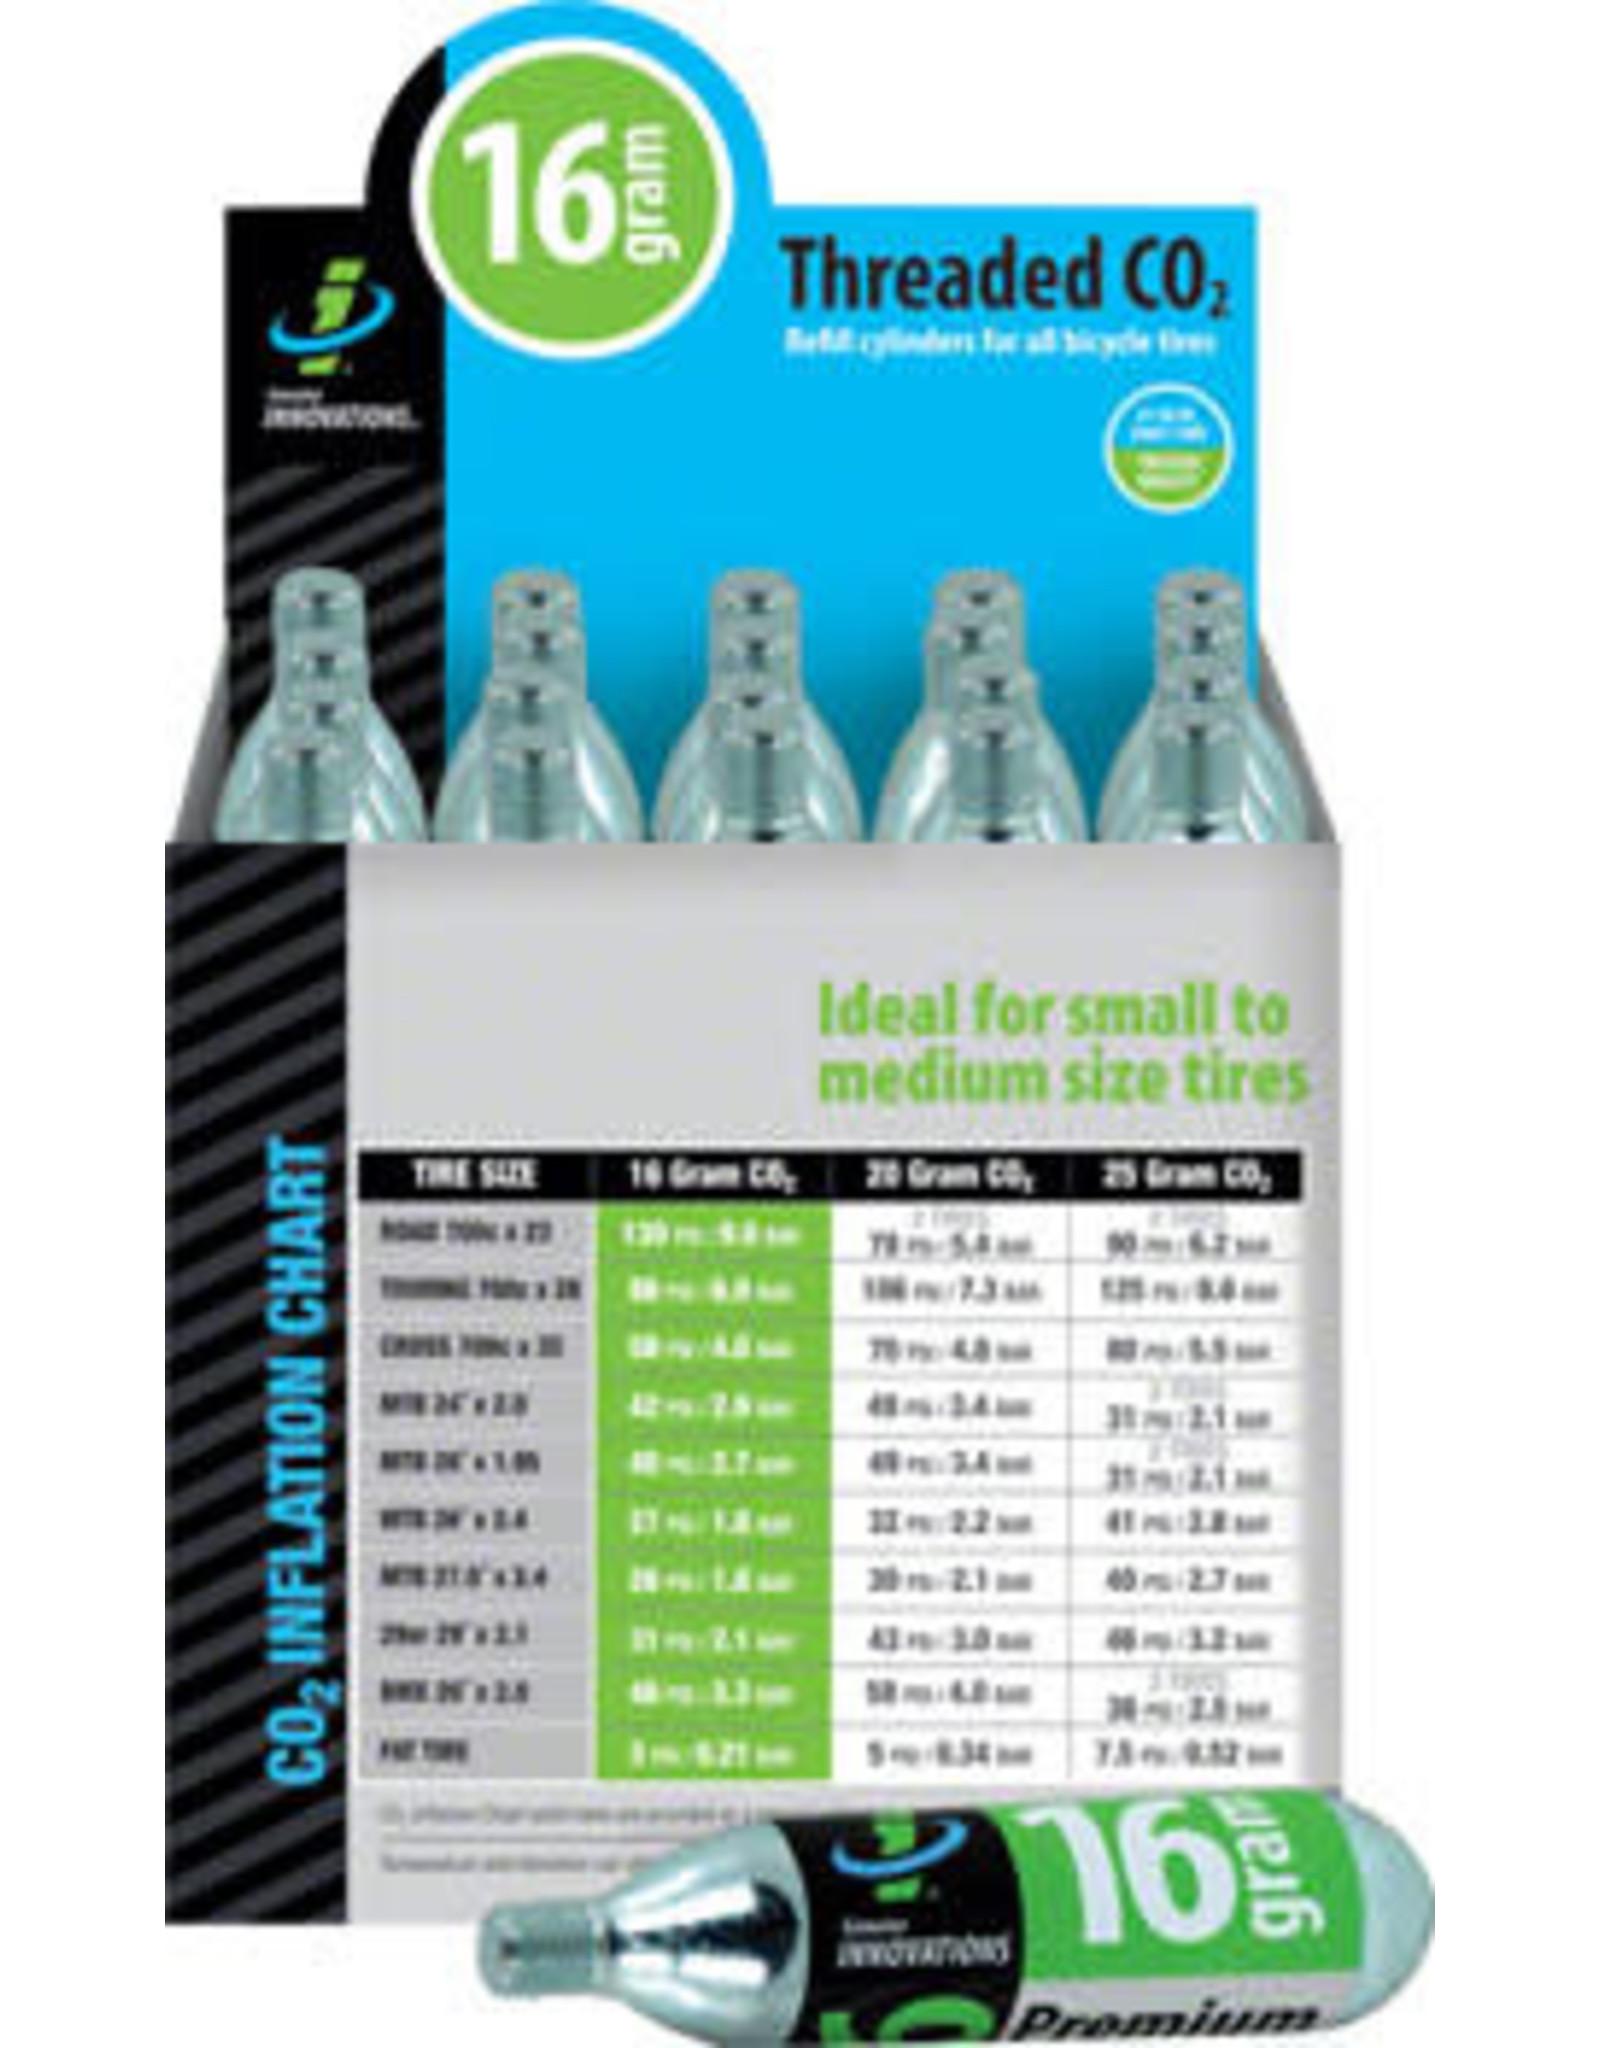 Genuine Innovations Genuine Innovations Cartridge CO2 Threaded 16G single